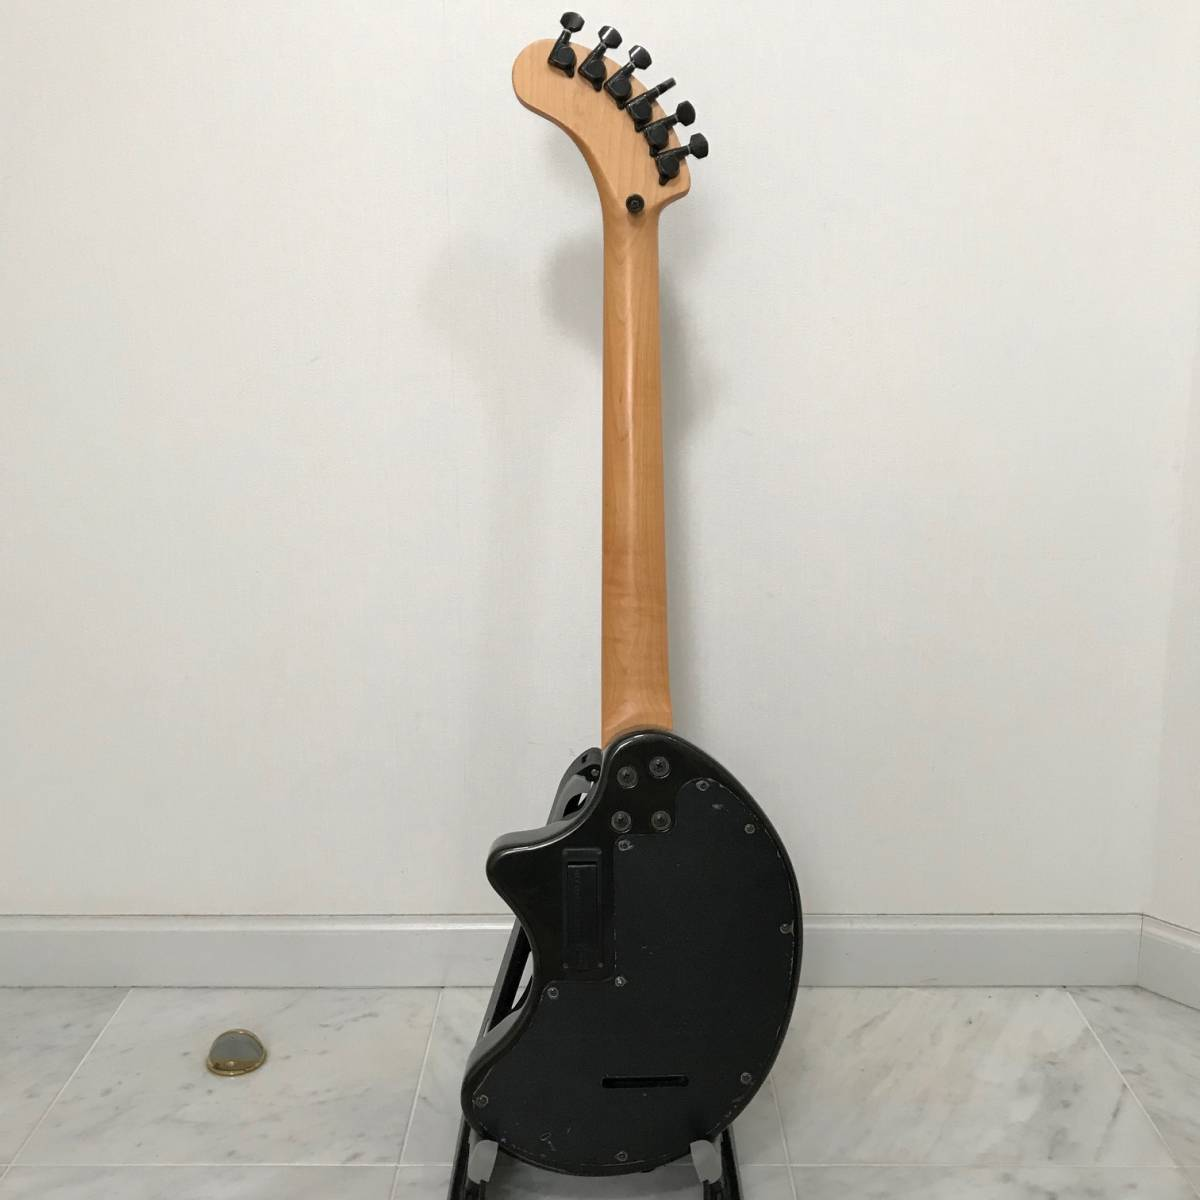 ZO-3 芸達者 ディストーション アンプ内臓 GOTOHペグ ギター ブラックメタリック ジャンク FERNANDES_画像7